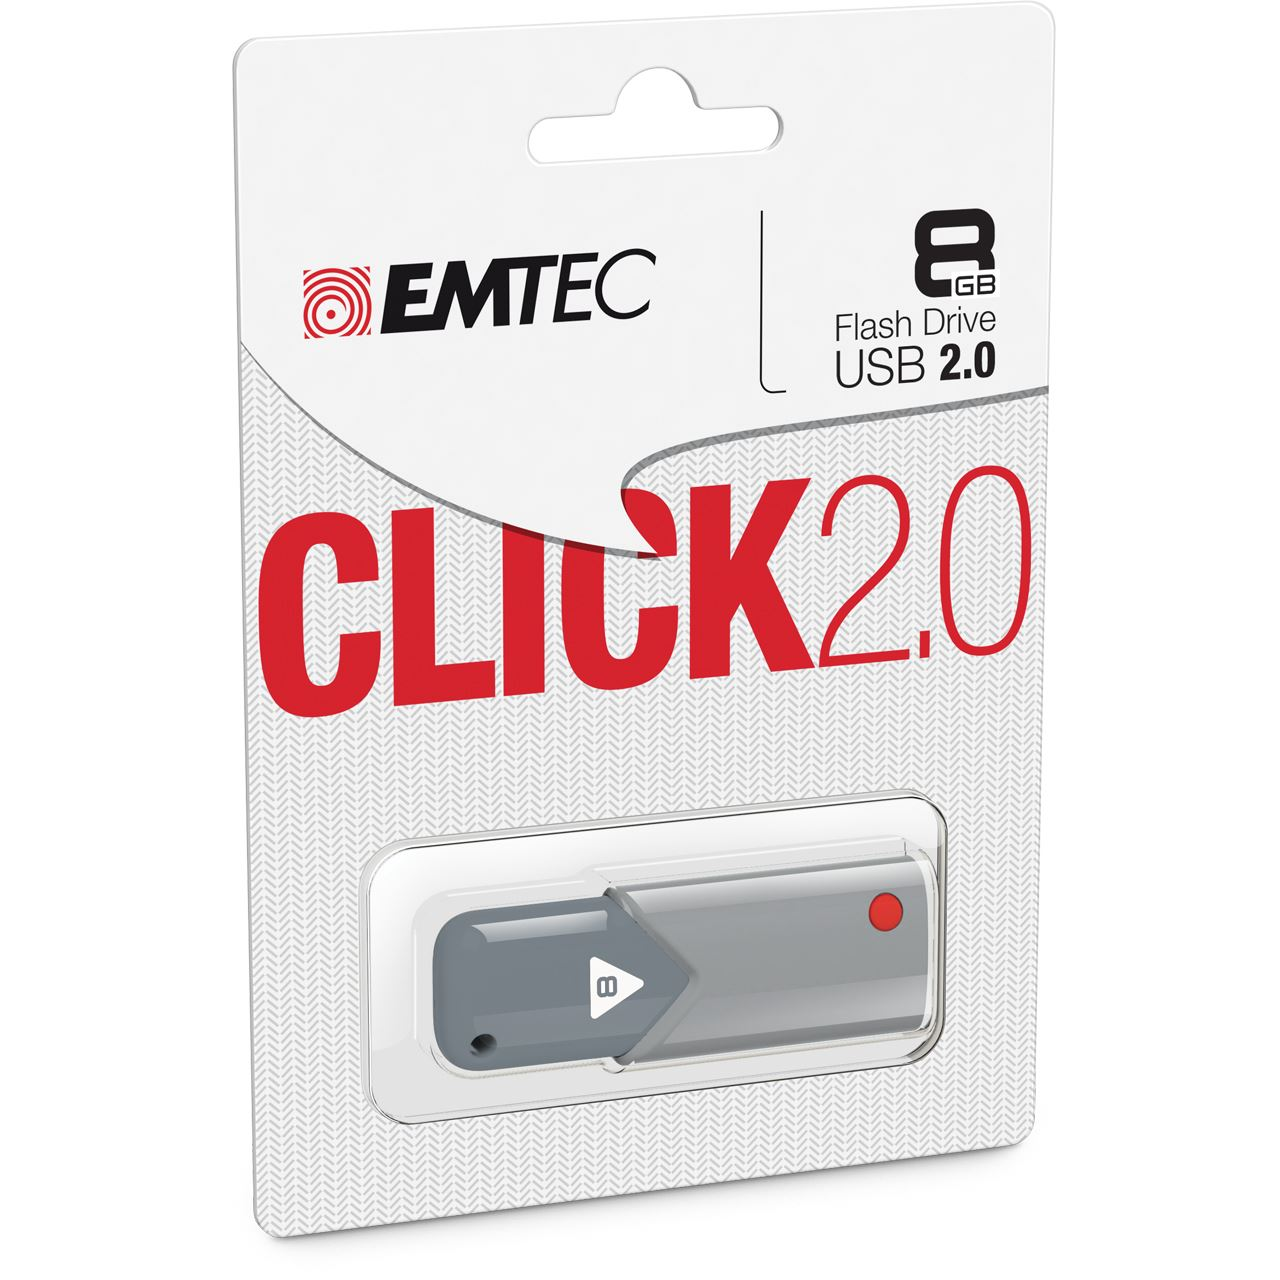 8 GB EMTEC Click grau USB 2.0 - 8GB Sticks | Mindfactory ...  8 GB EMTEC Clic...